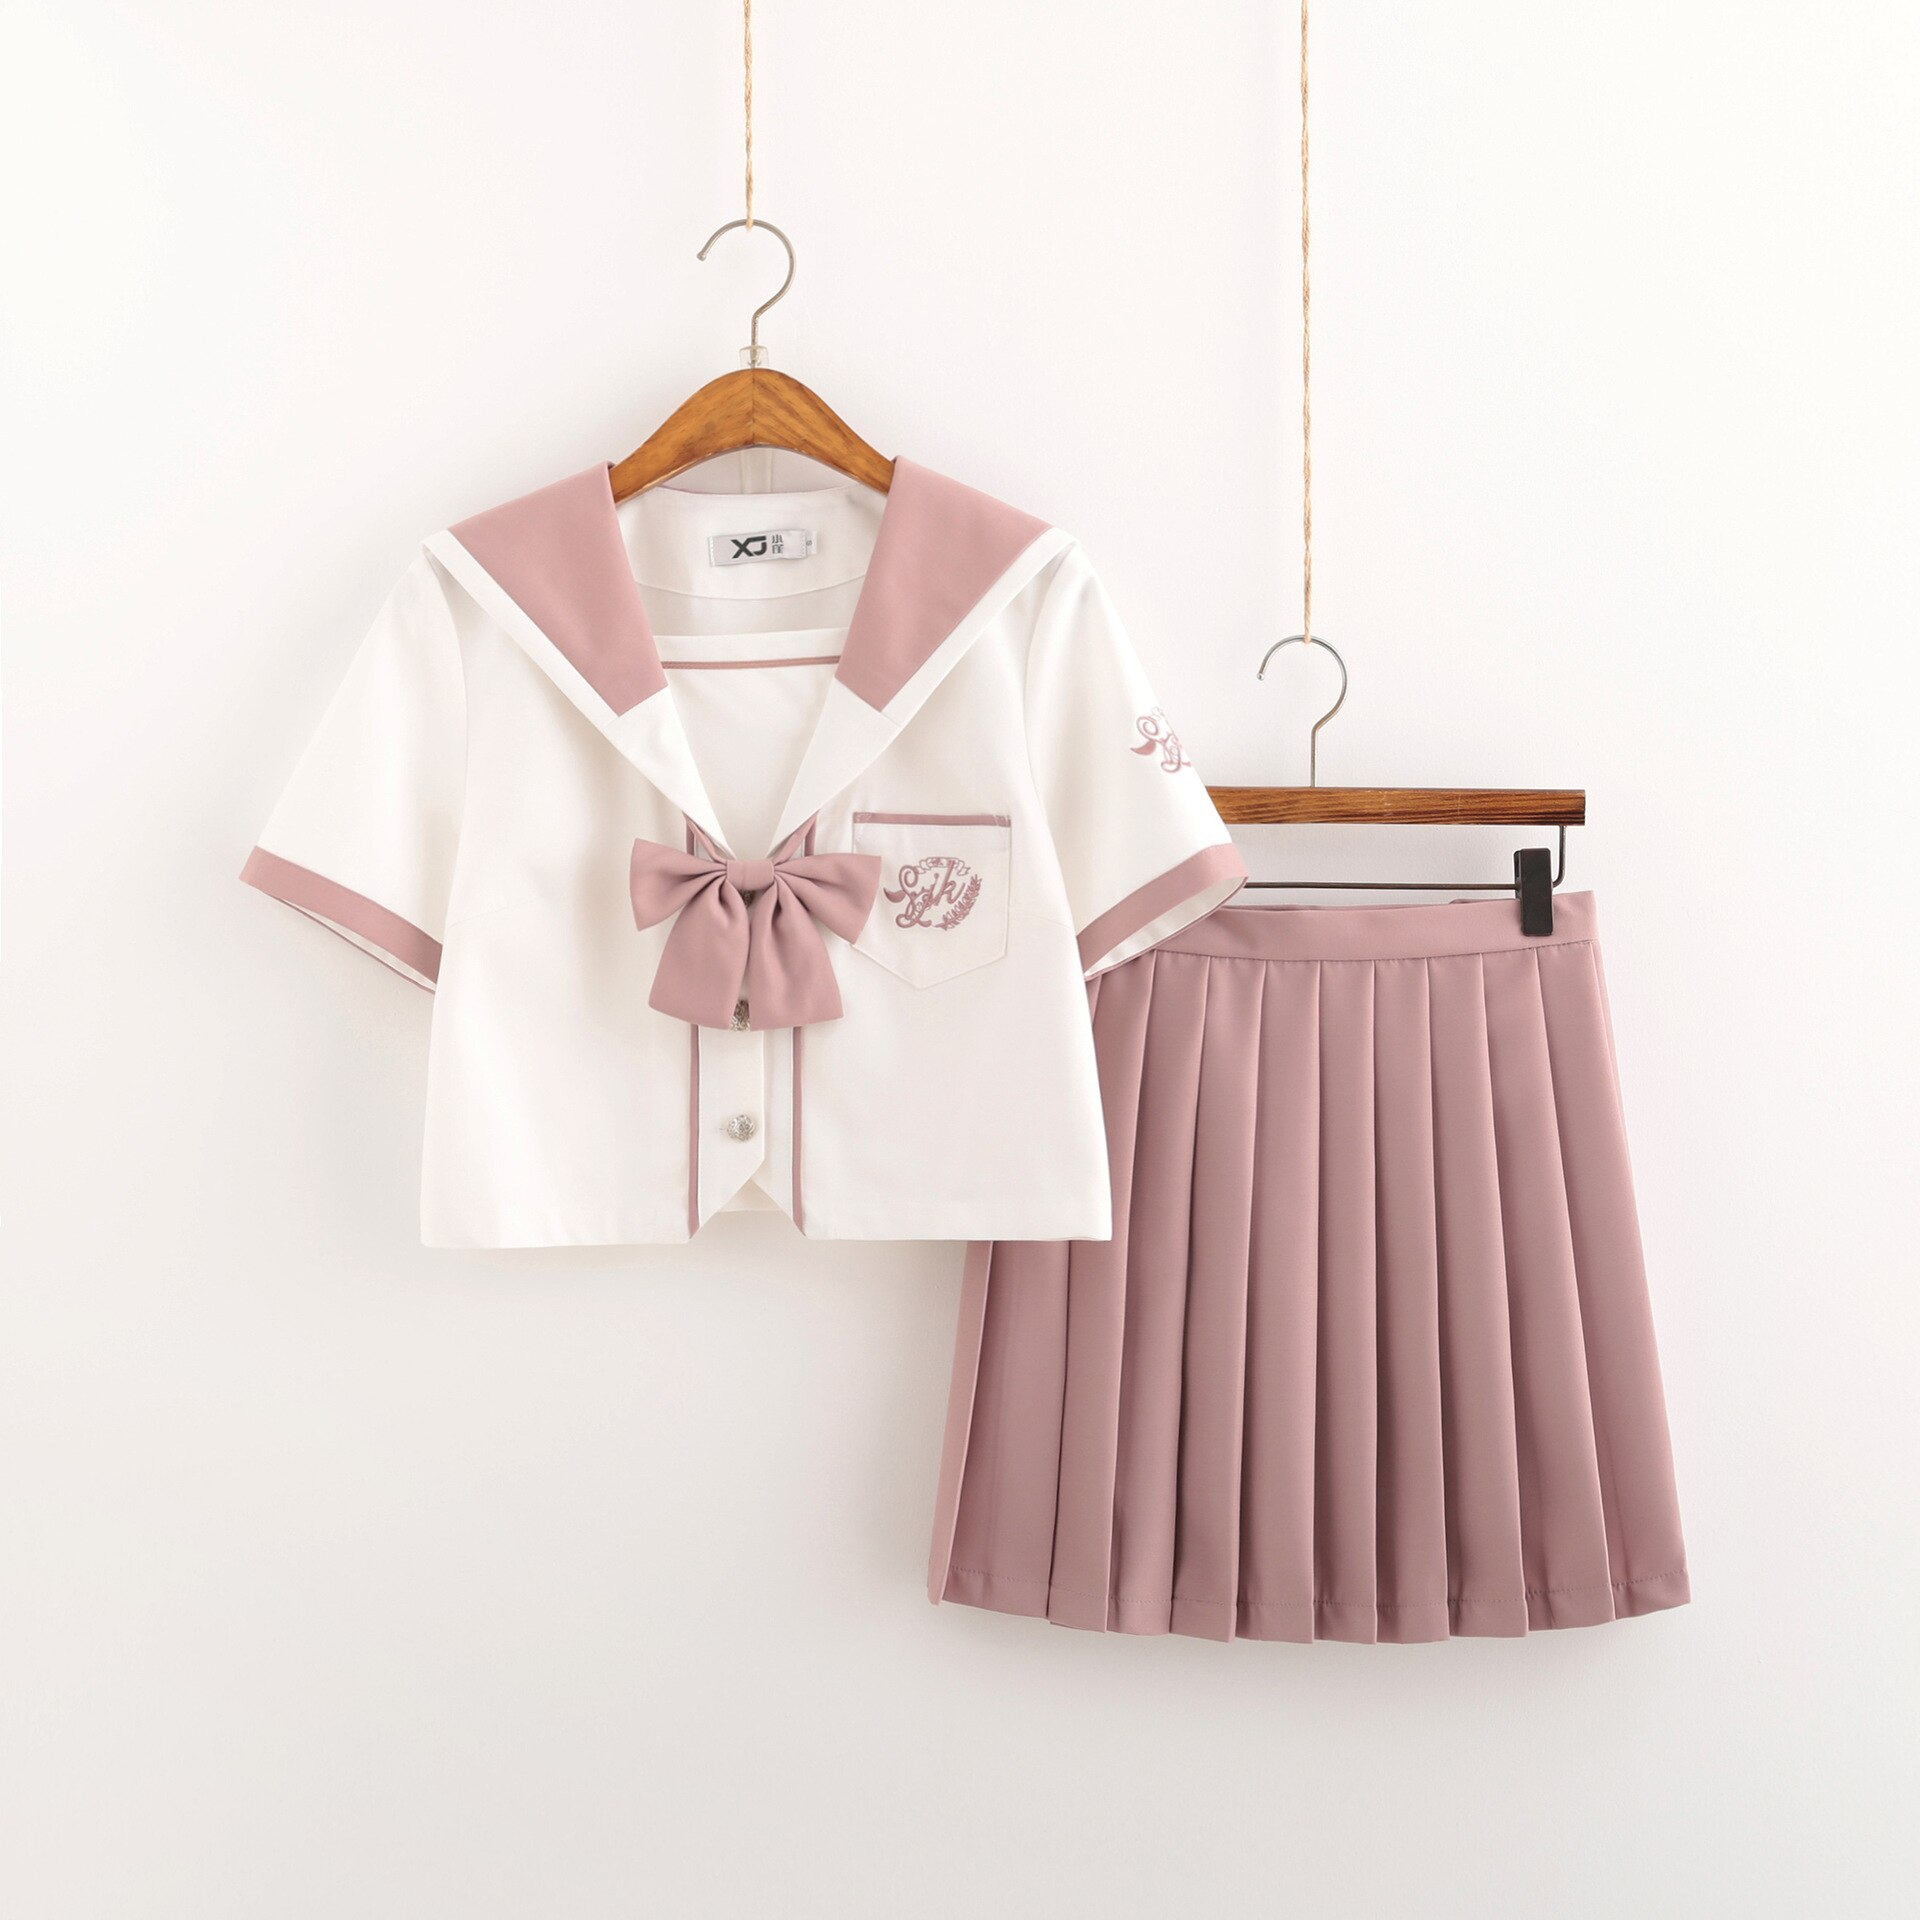 school uniform outfit white short sleeve top and pink skirt 2021 Pink White JK Uniform Summer Short Sleeve Japanese School Uniforms Girls Sailor Sets Pleated Skirt JK Uniform COS Costumes